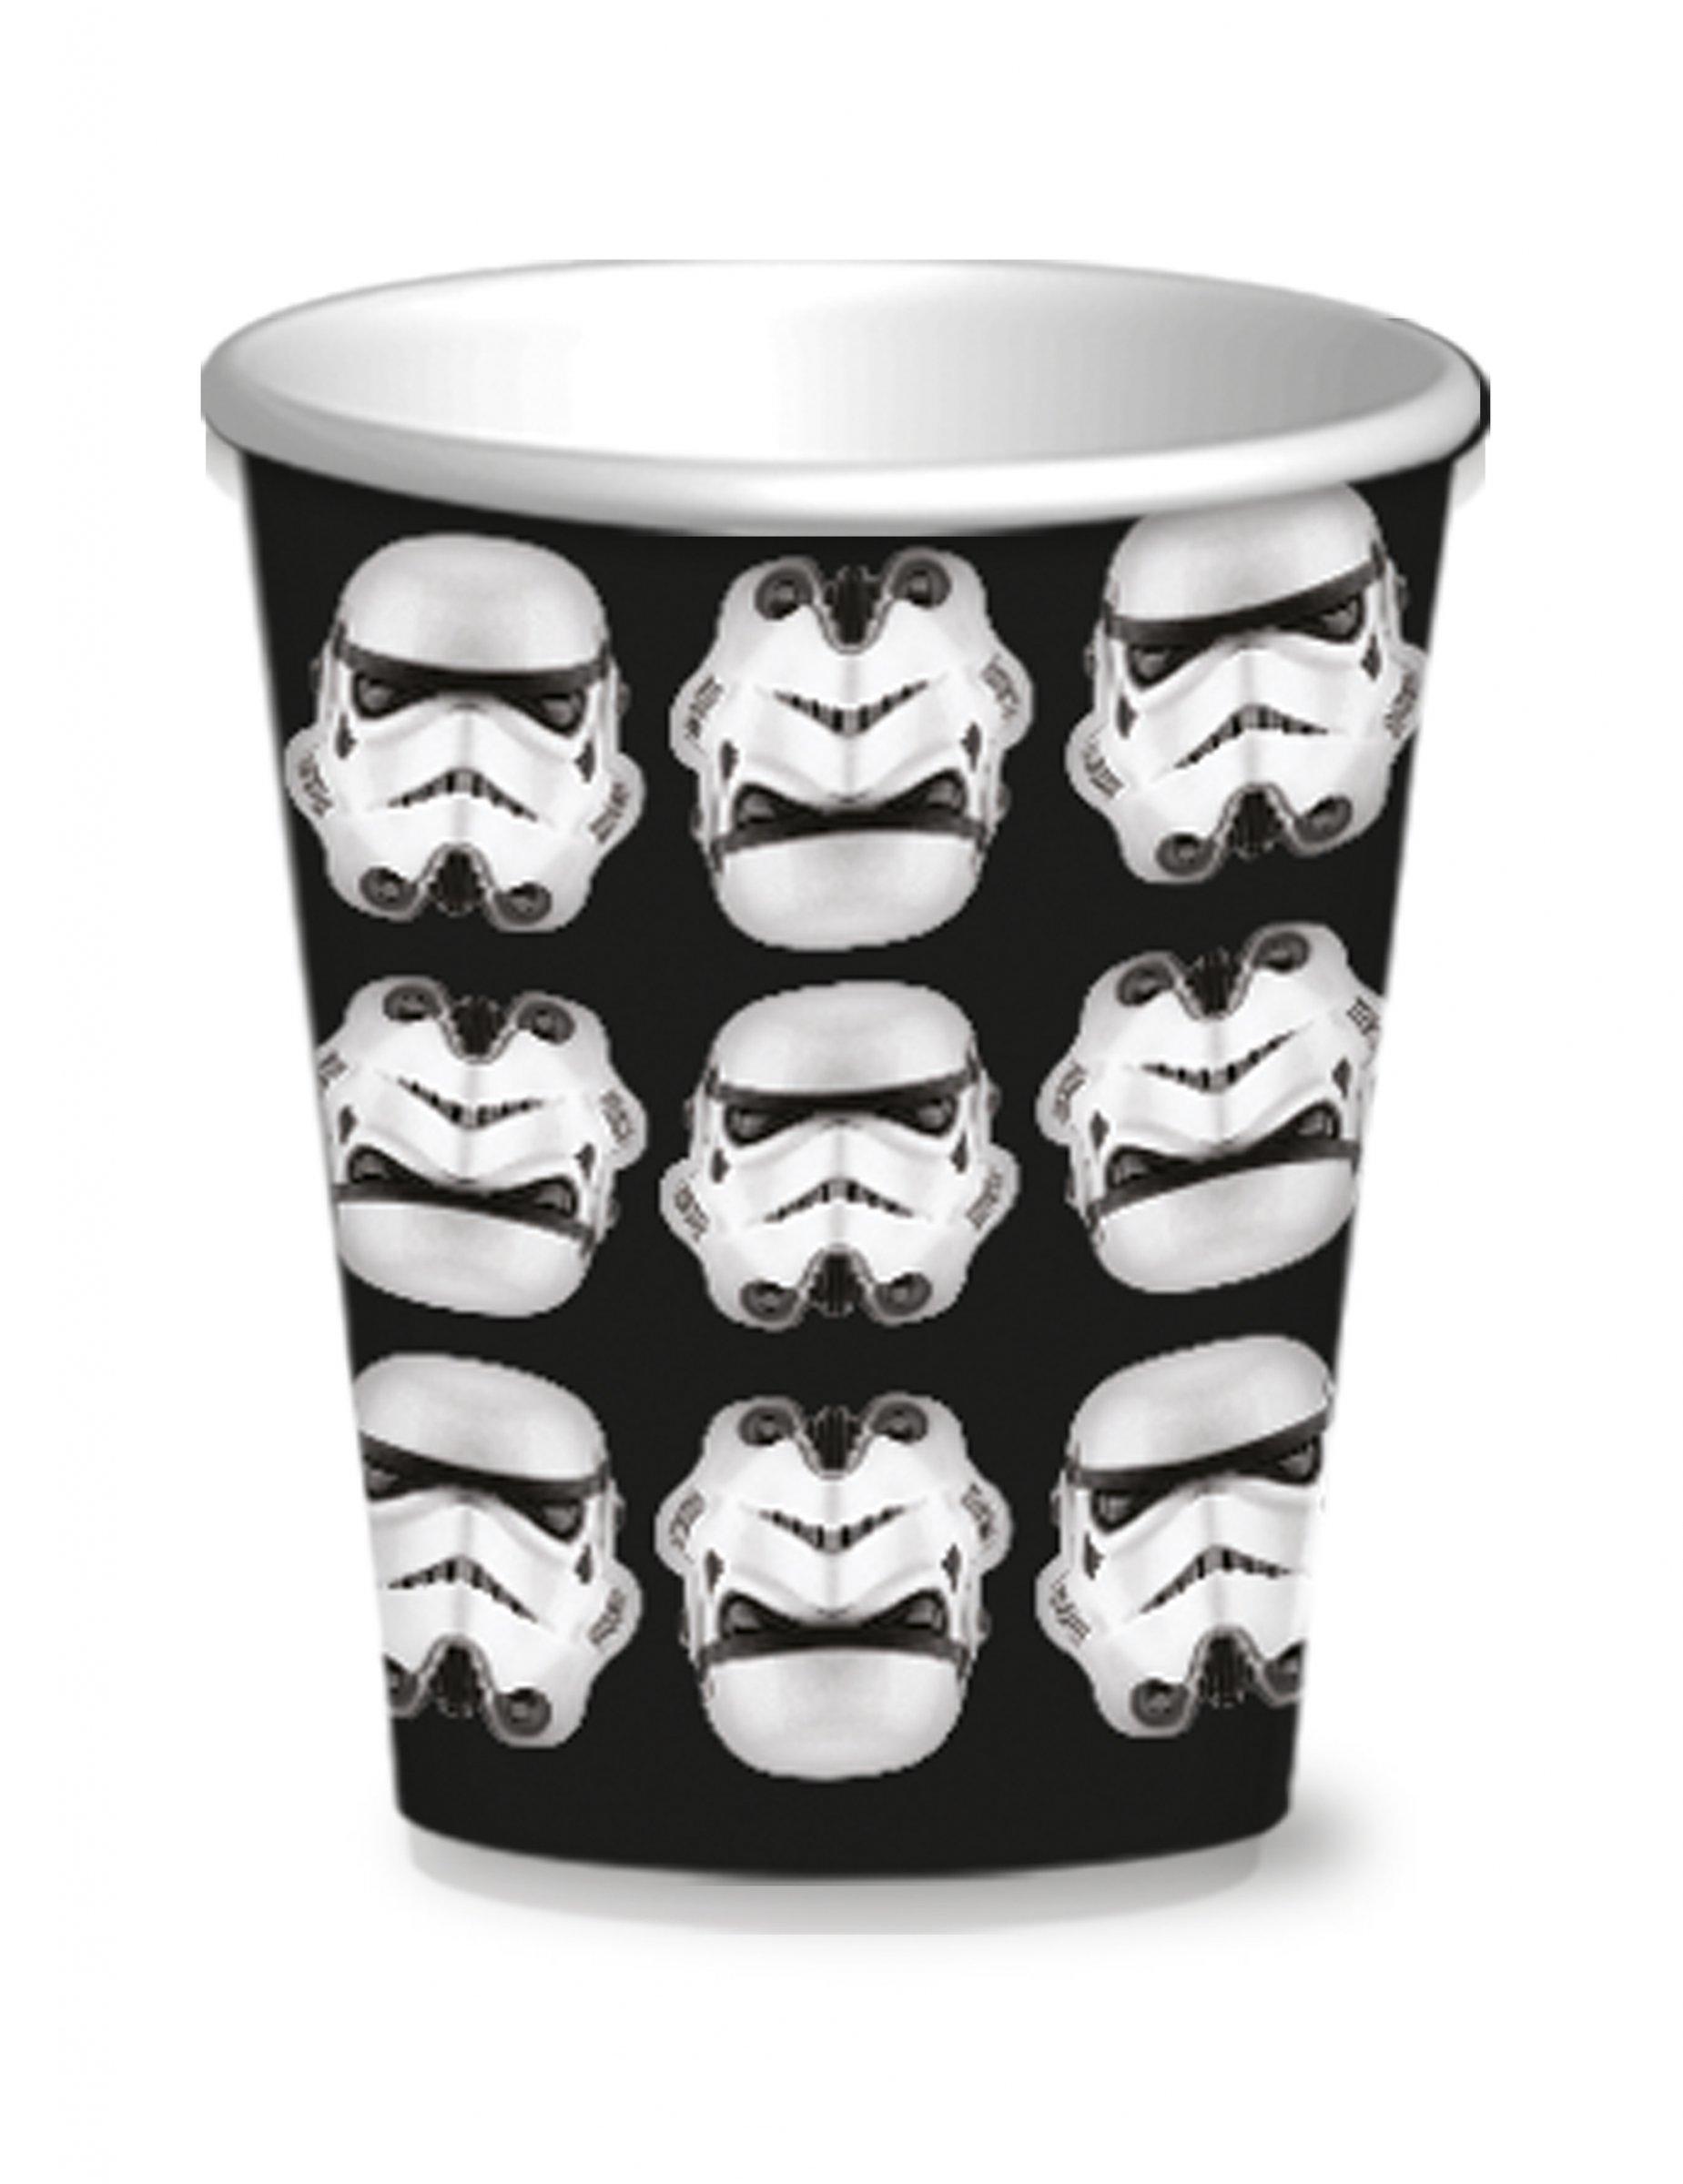 stormtrooper becher star wars tischdeko 8 st ck schwarz weiss 250ml g nstige faschings. Black Bedroom Furniture Sets. Home Design Ideas